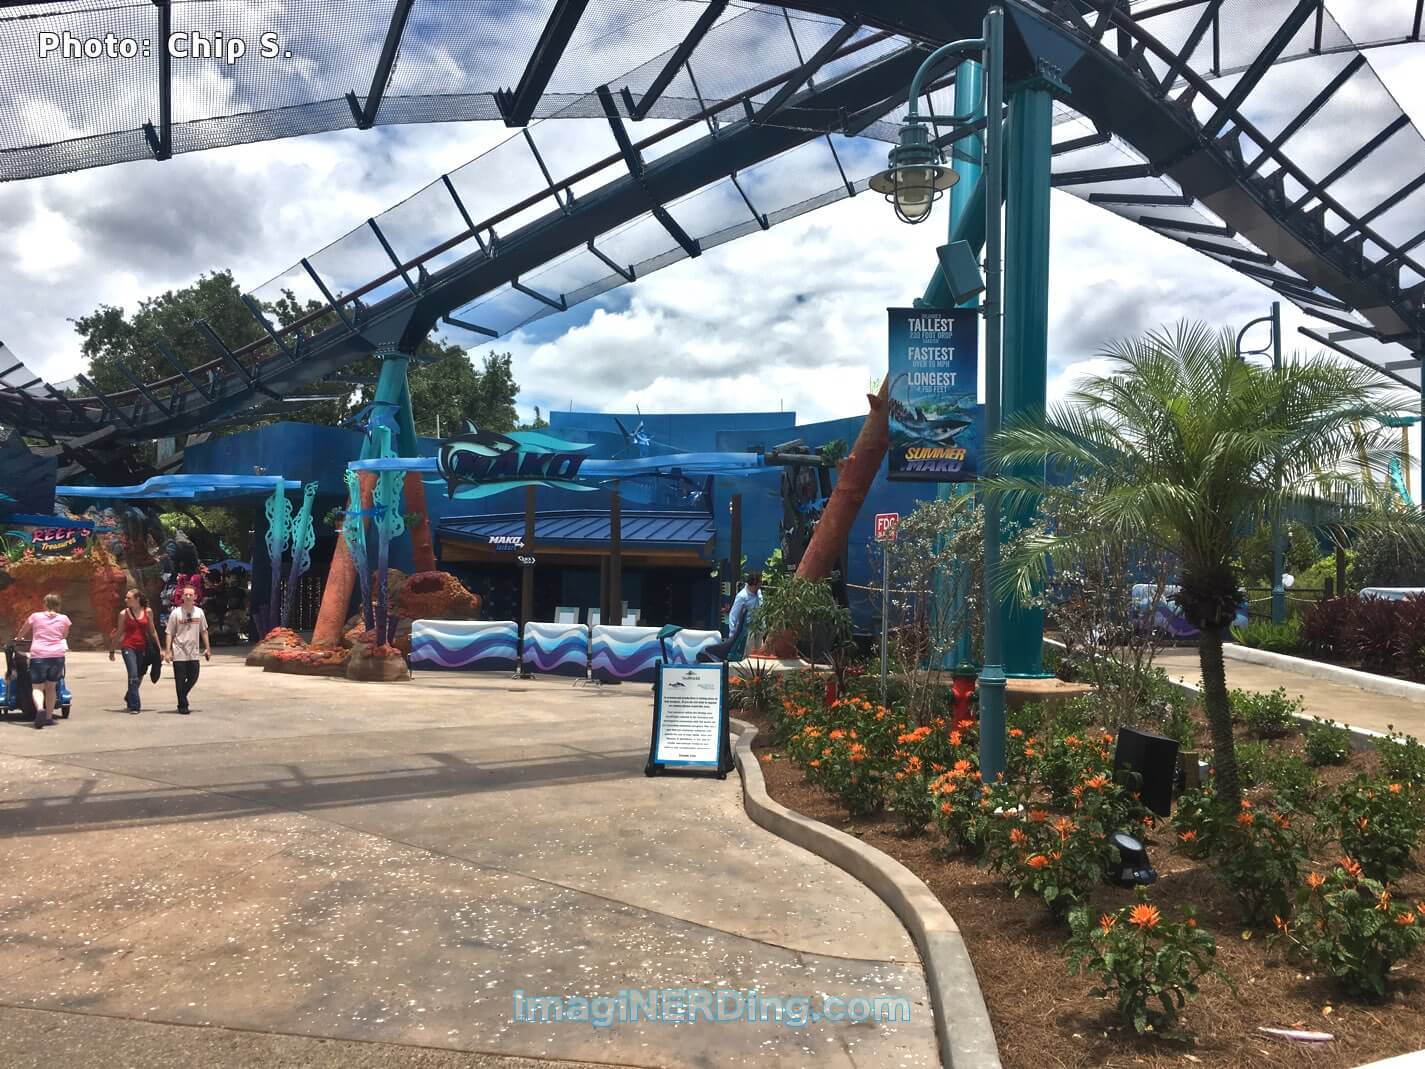 seaworld roller coasters kraken manta and mako imaginerding